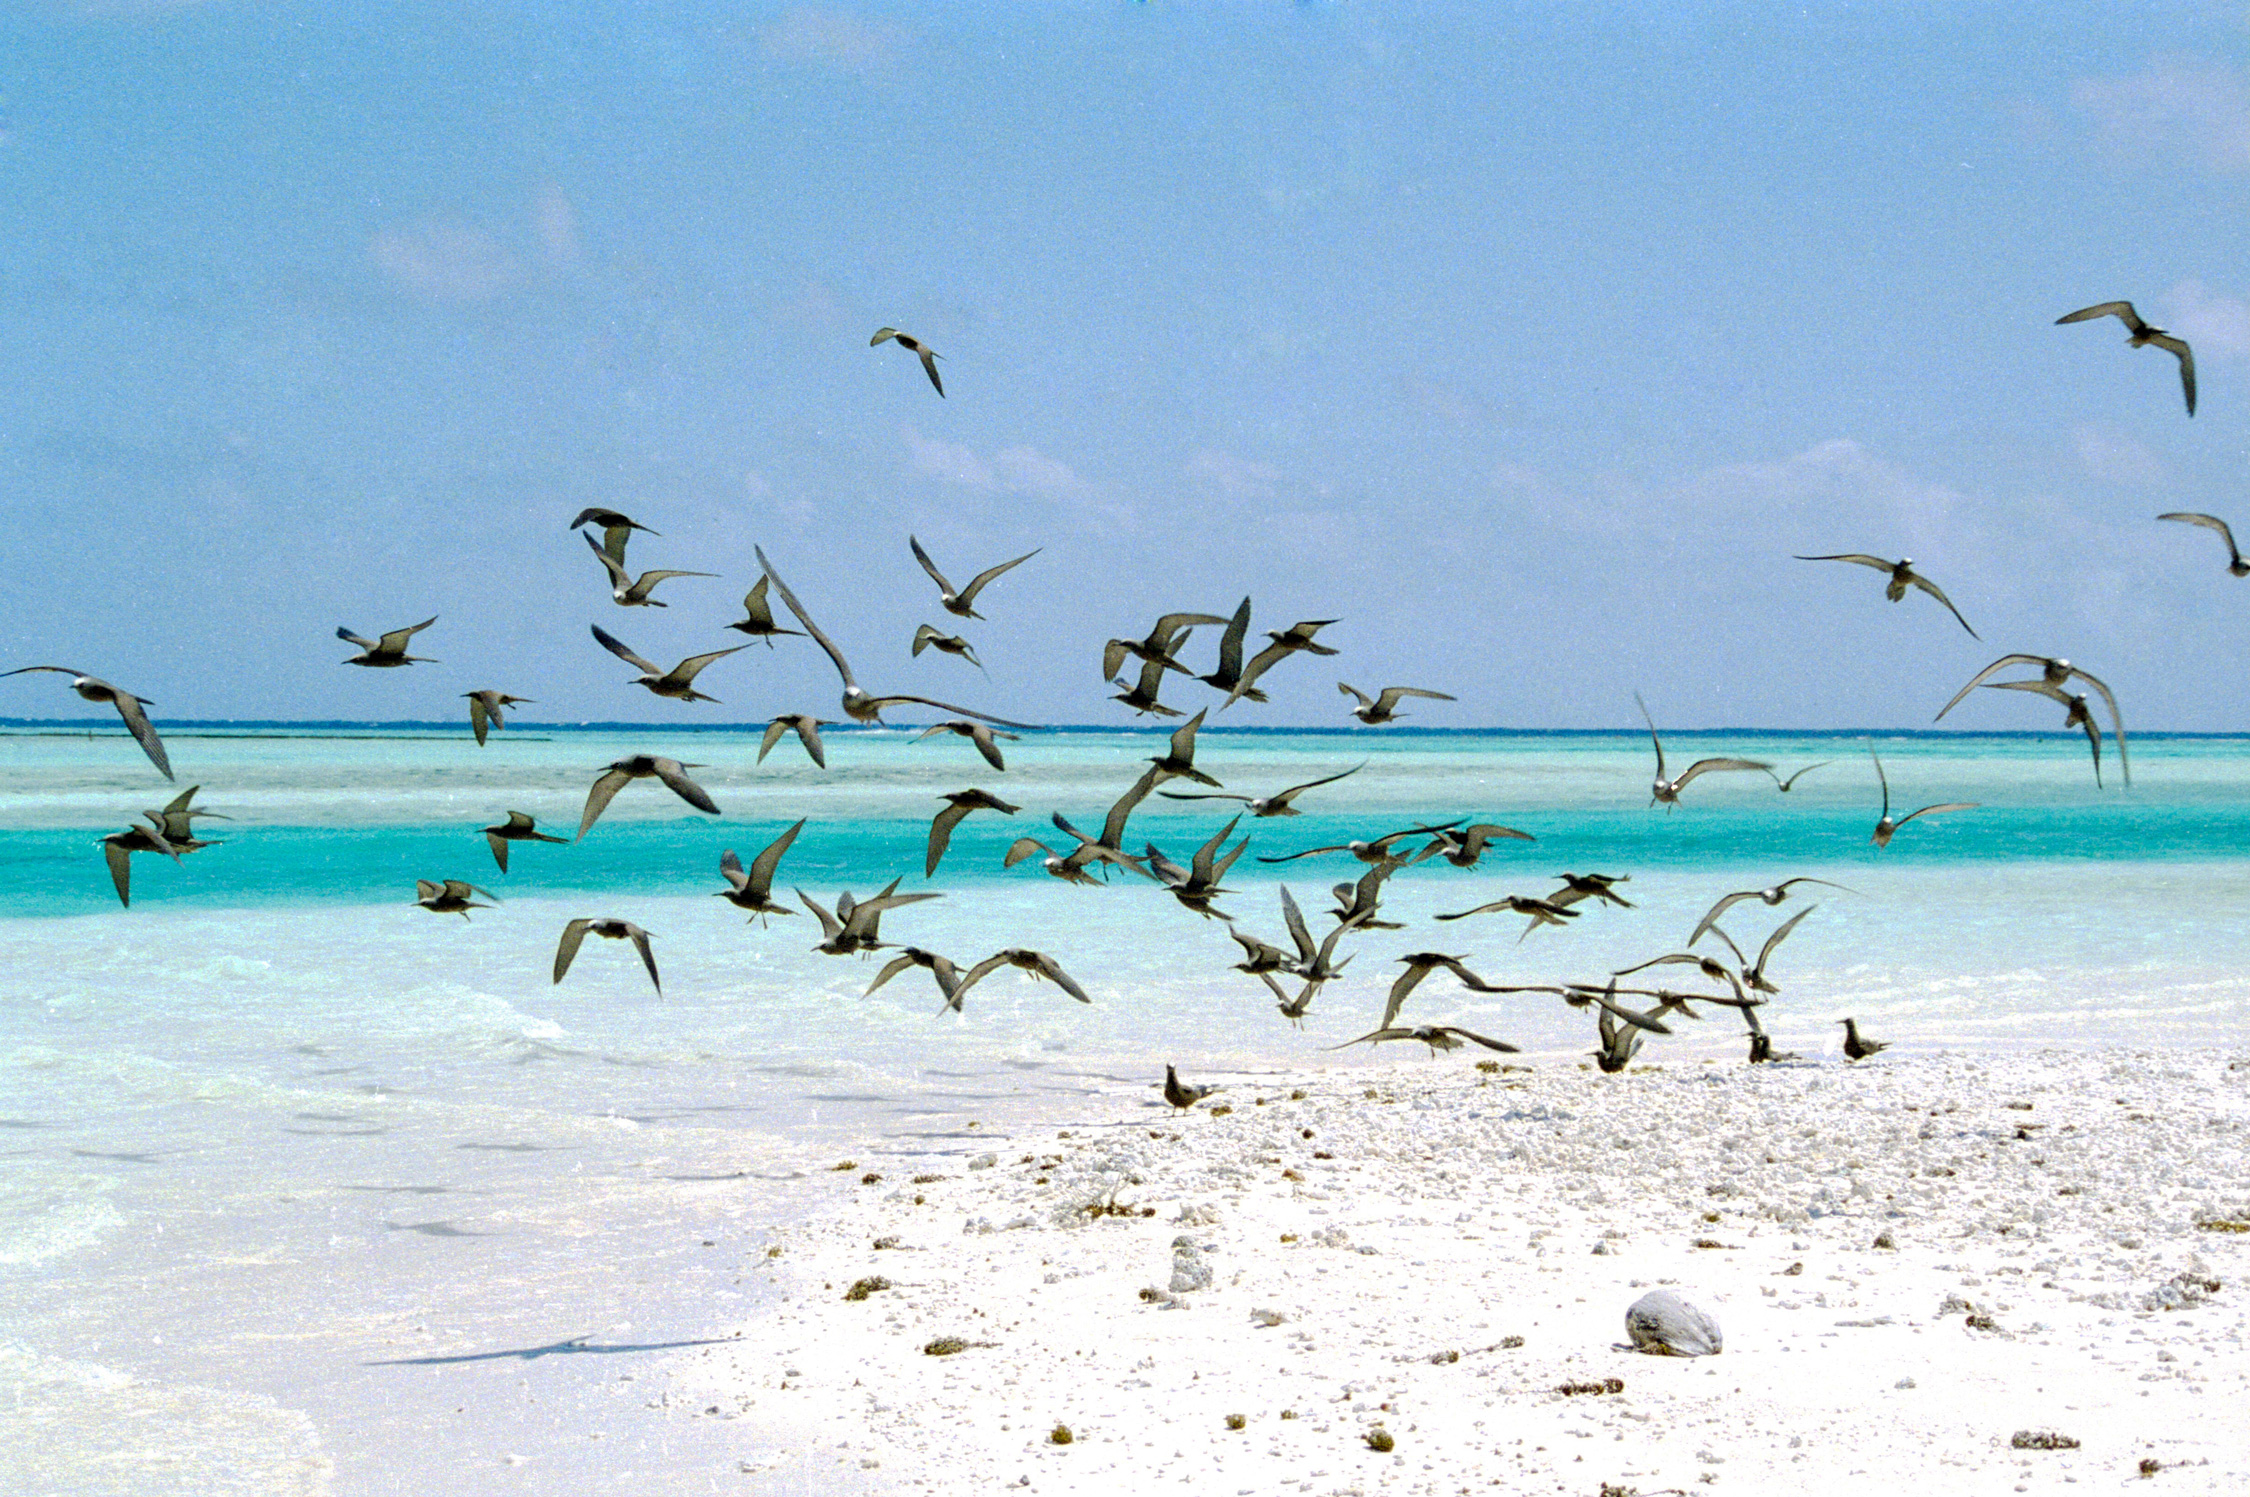 polynesie-francaise-tahiti-pacifique-copyright-maeva-destombes-tetiaroa-2016-10-29-0003